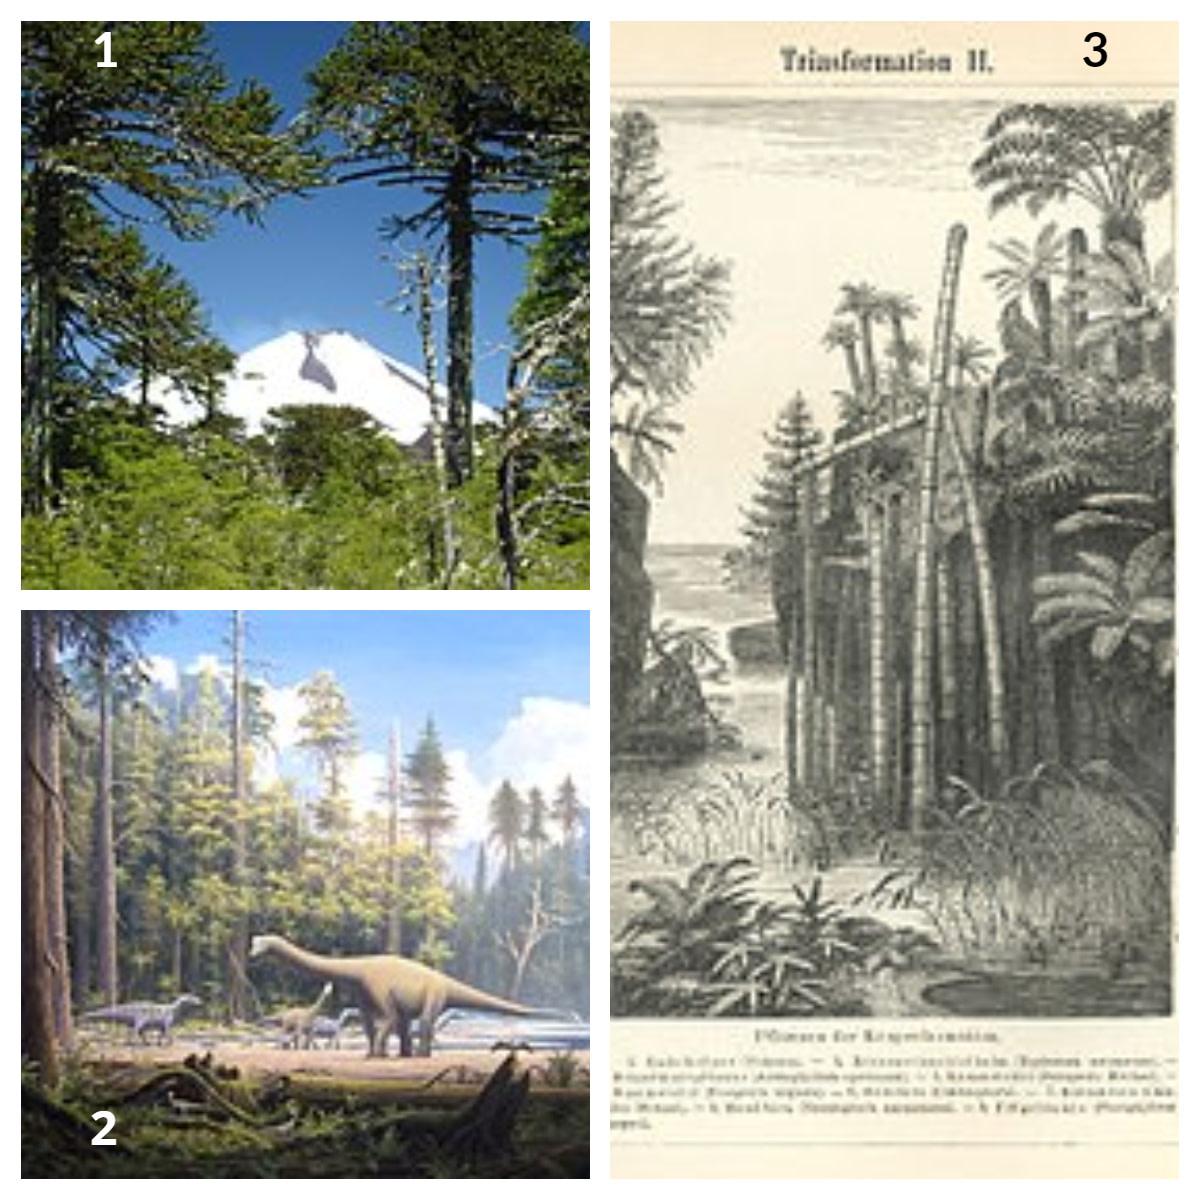 1.  Jurassic Period 2.  Cretaceous Period - Typical Conifers 3.  Triassic Period - Typical Flora